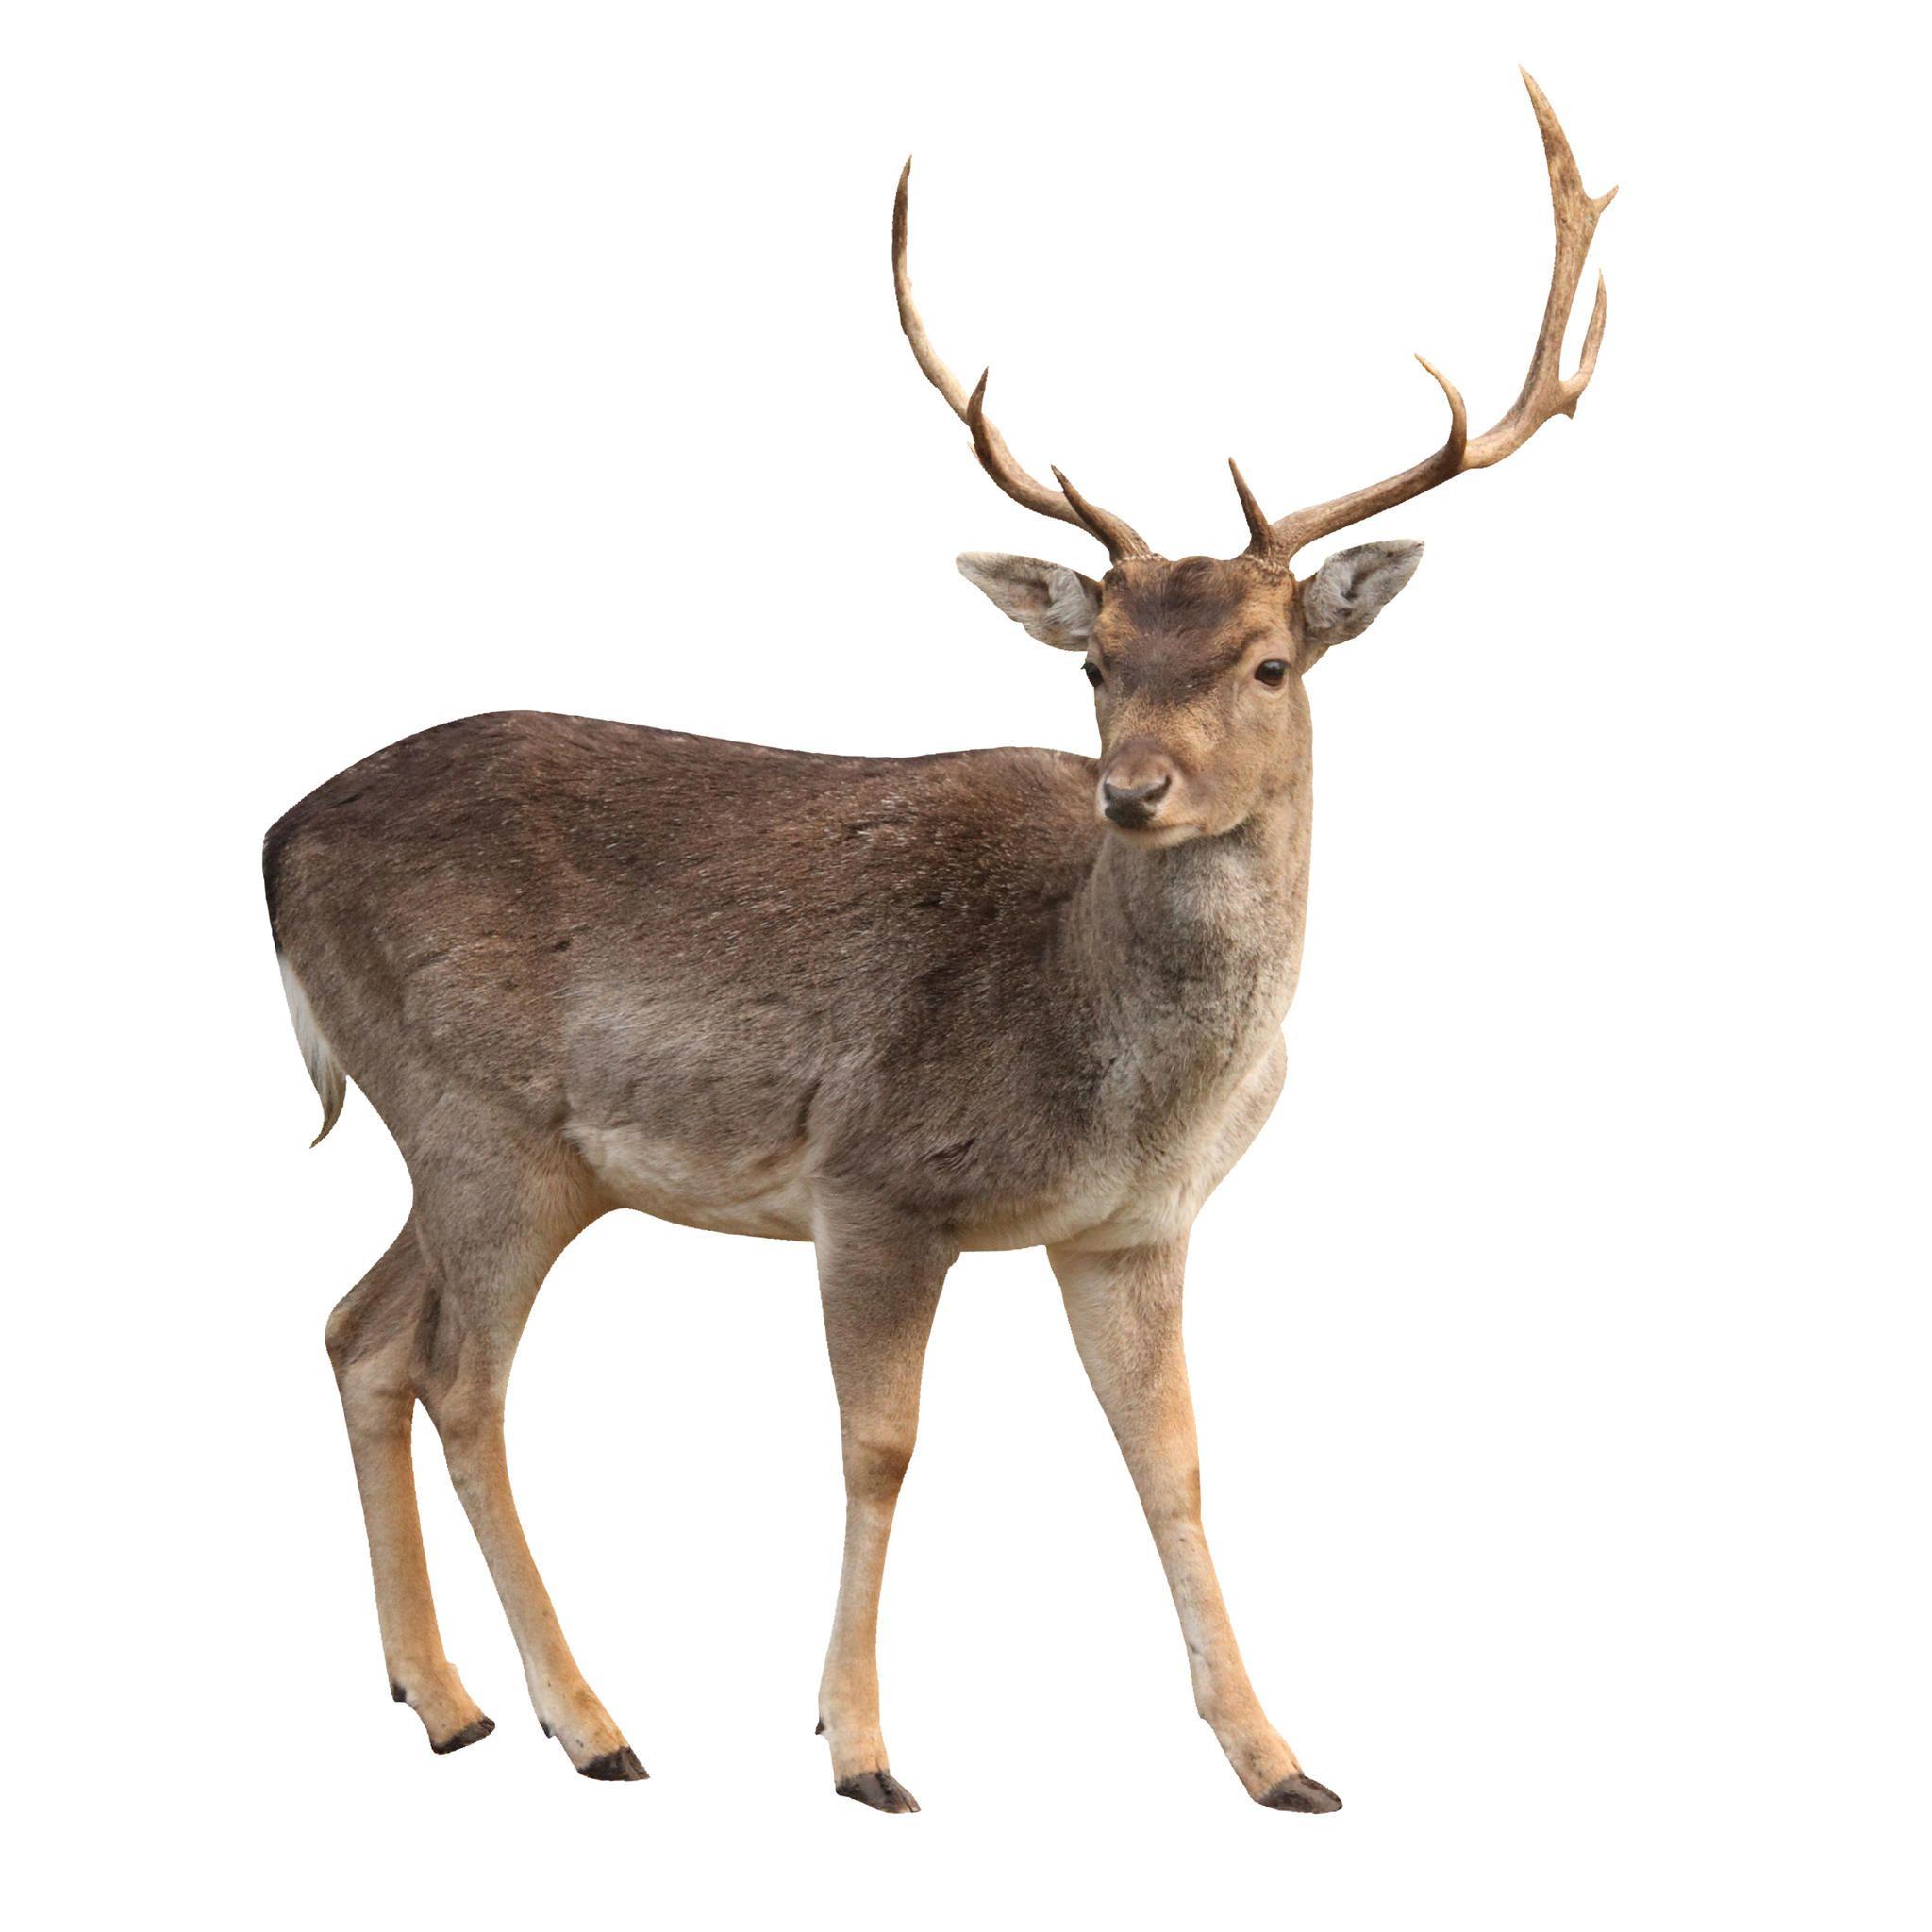 Buck Deer Isolated With Clipping Path Animals Wild Deer Buck Deer